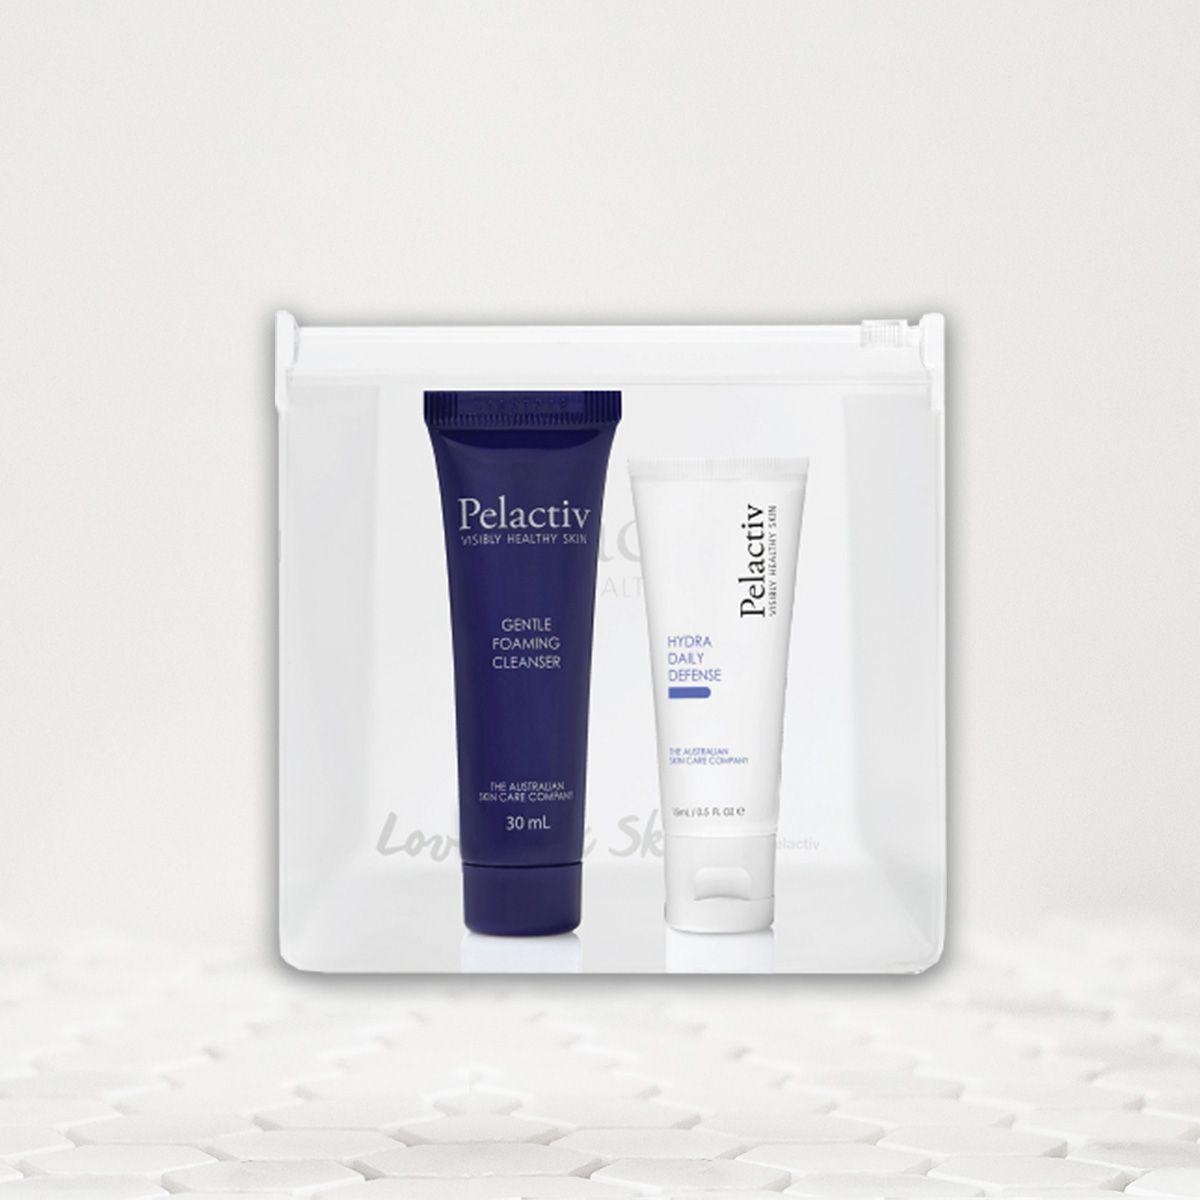 FREE Travel Essentials Duo 💙 in 2020 Skin care, Travel